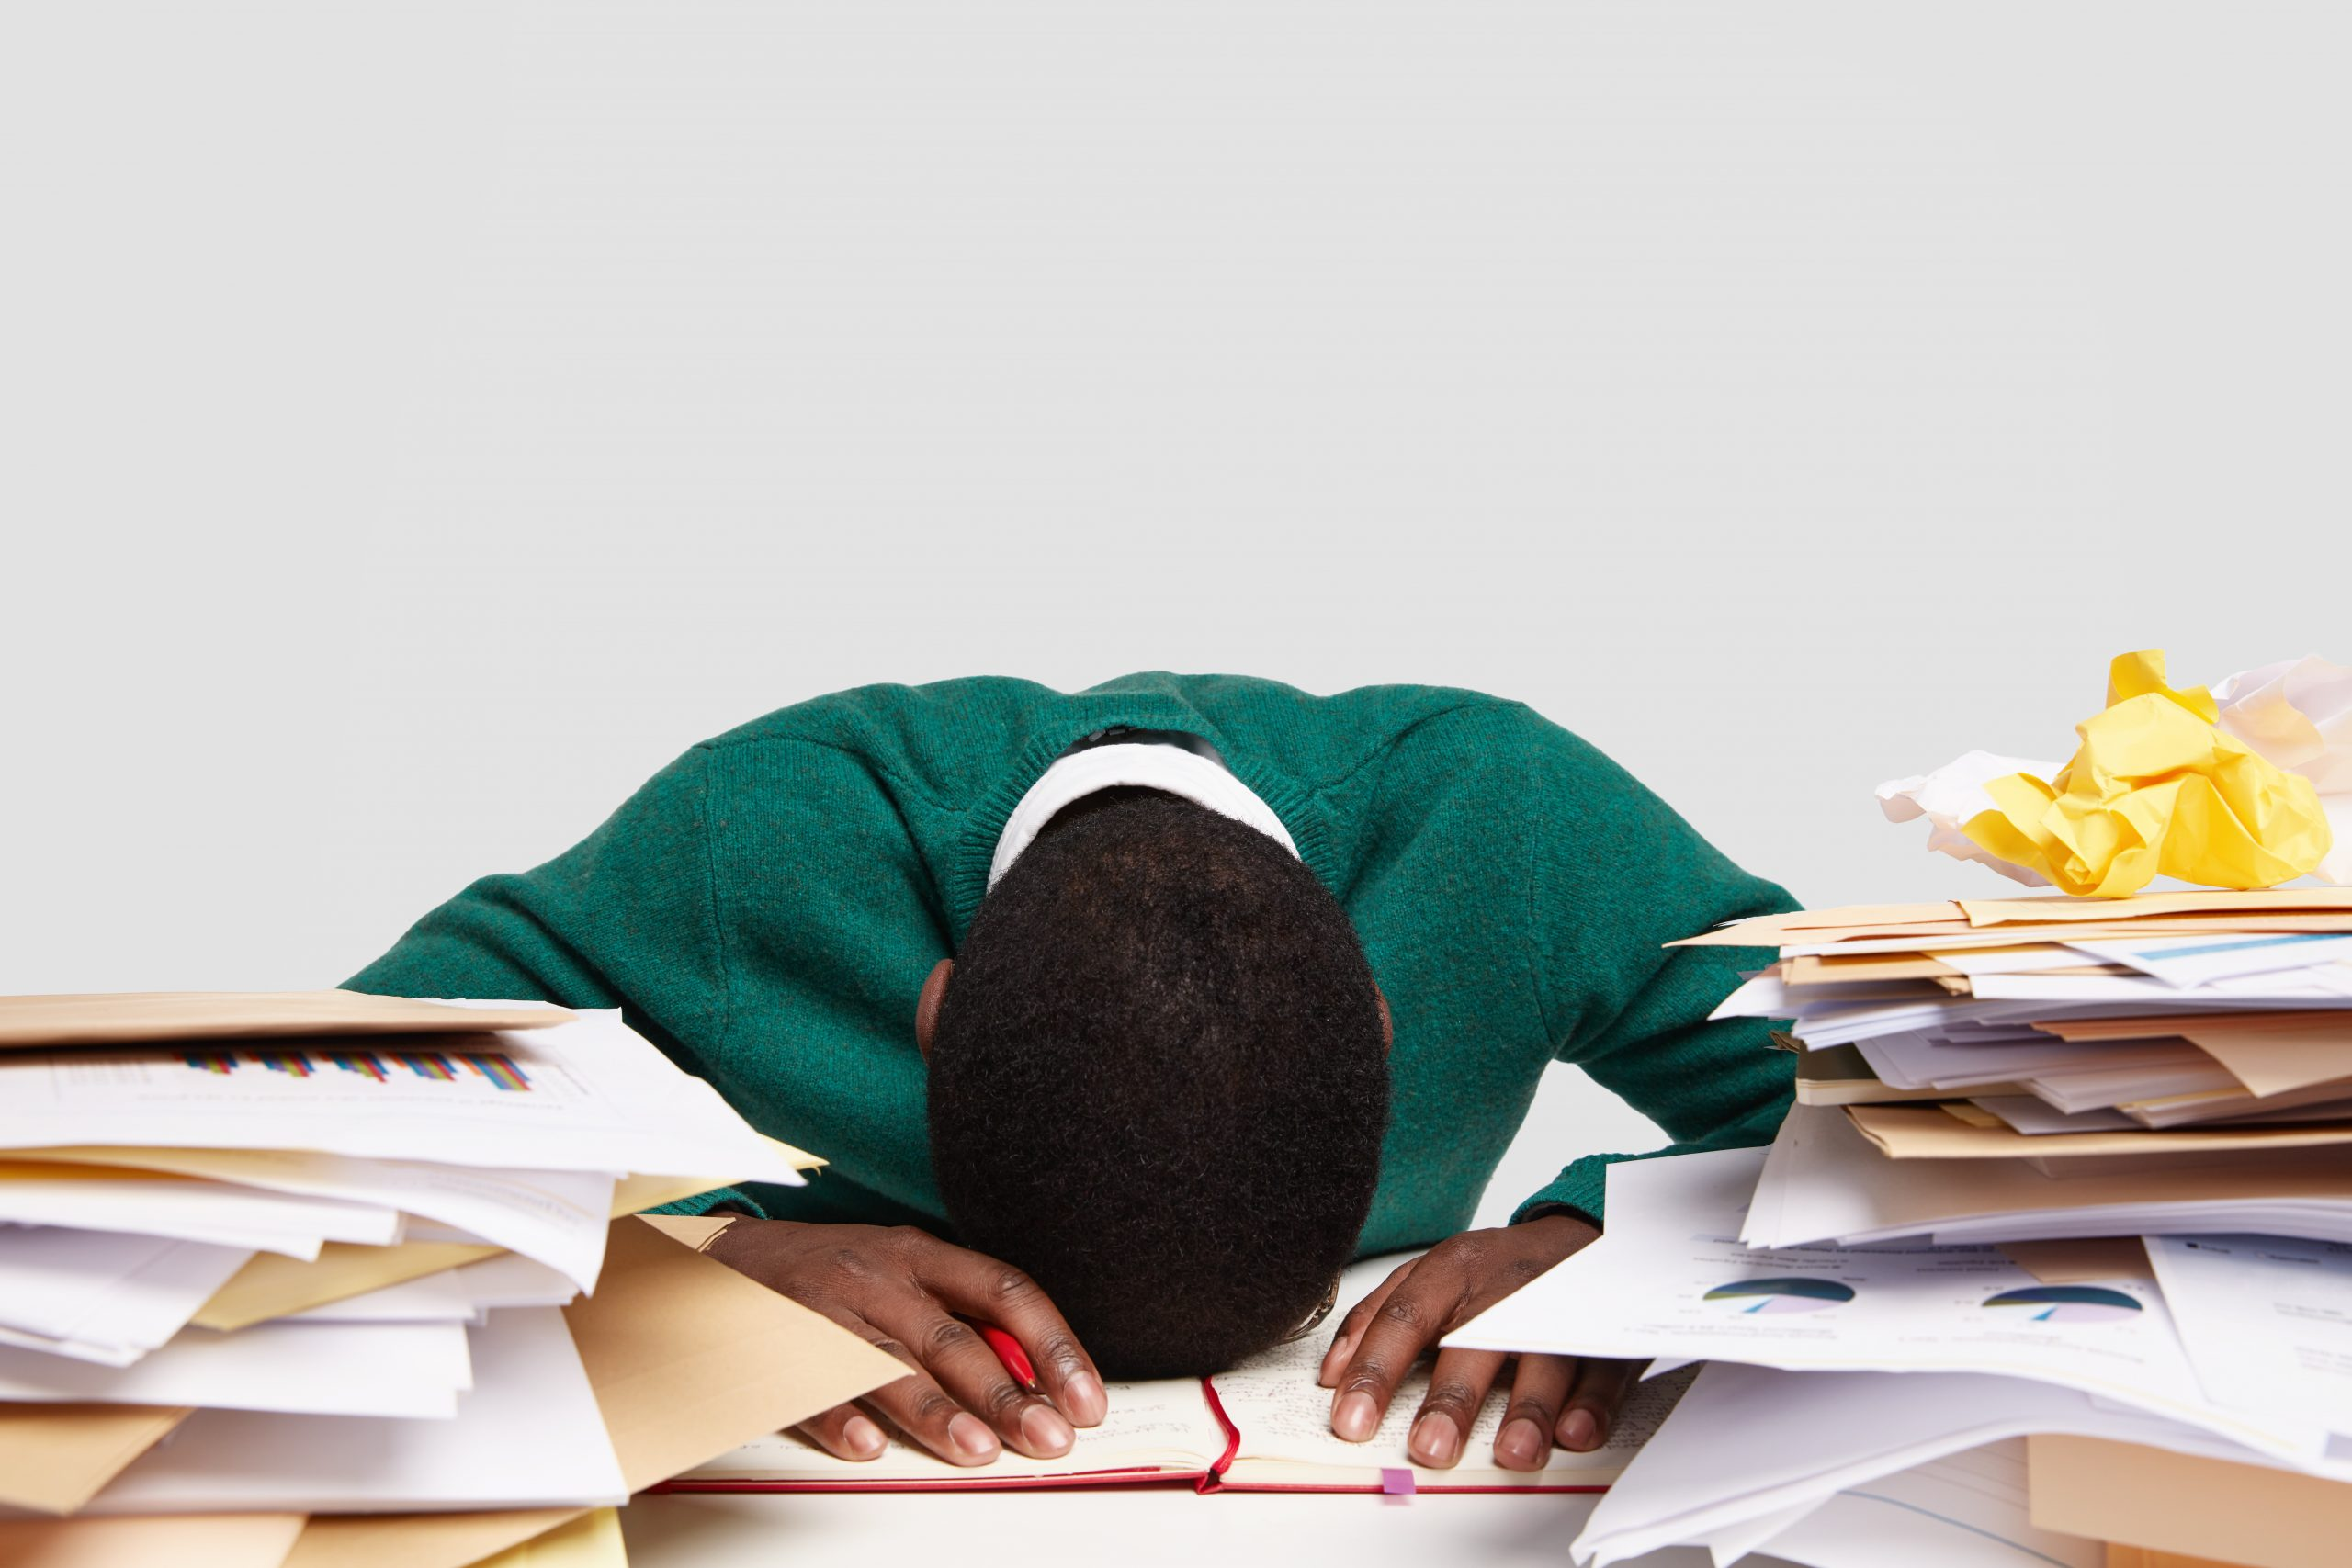 Ciri-ciri Burnout, Pertanda Kamu Harus Rehat Sejenak